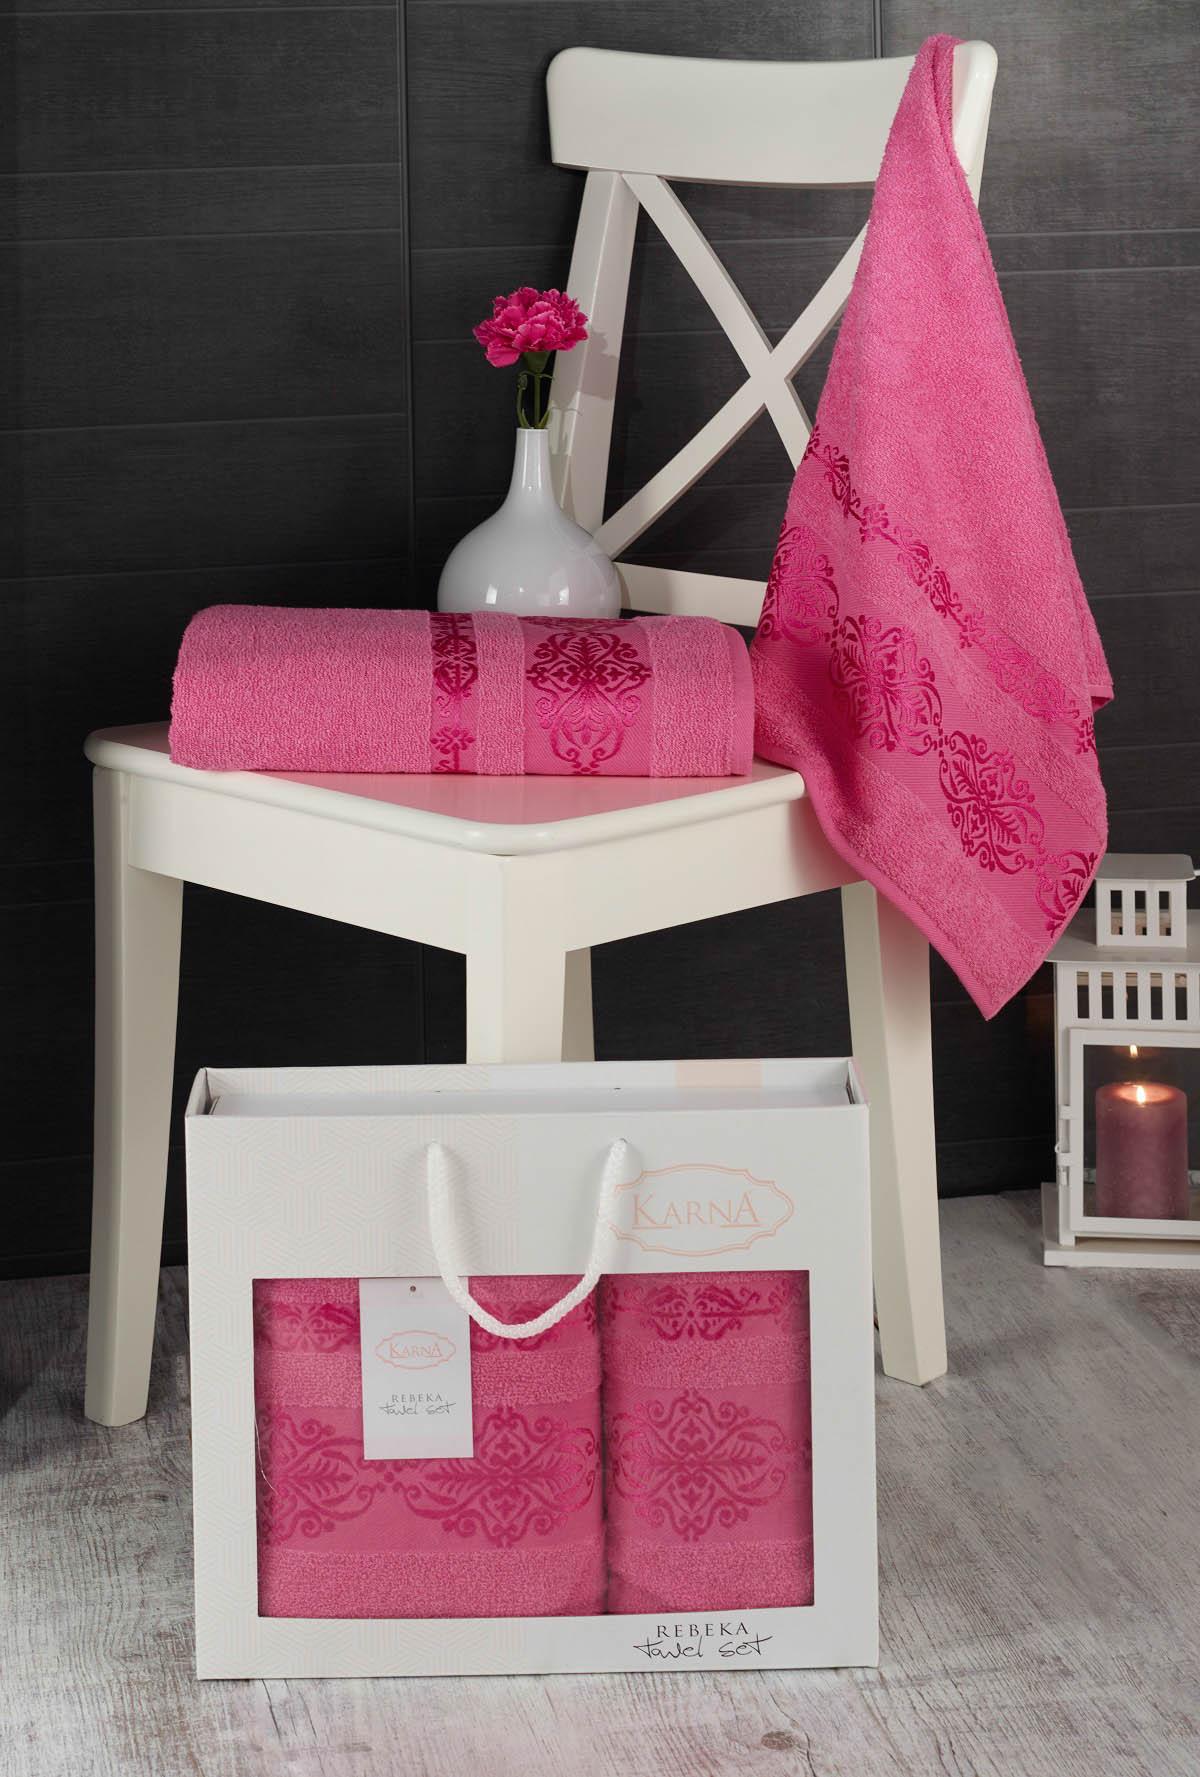 Полотенца Karna Полотенце Rebeca Цвет: Розовый (50х90 см,70х140 см) набор из 3 полотенец merzuka sakura 50х90 2 70х140 8432 терракотовый